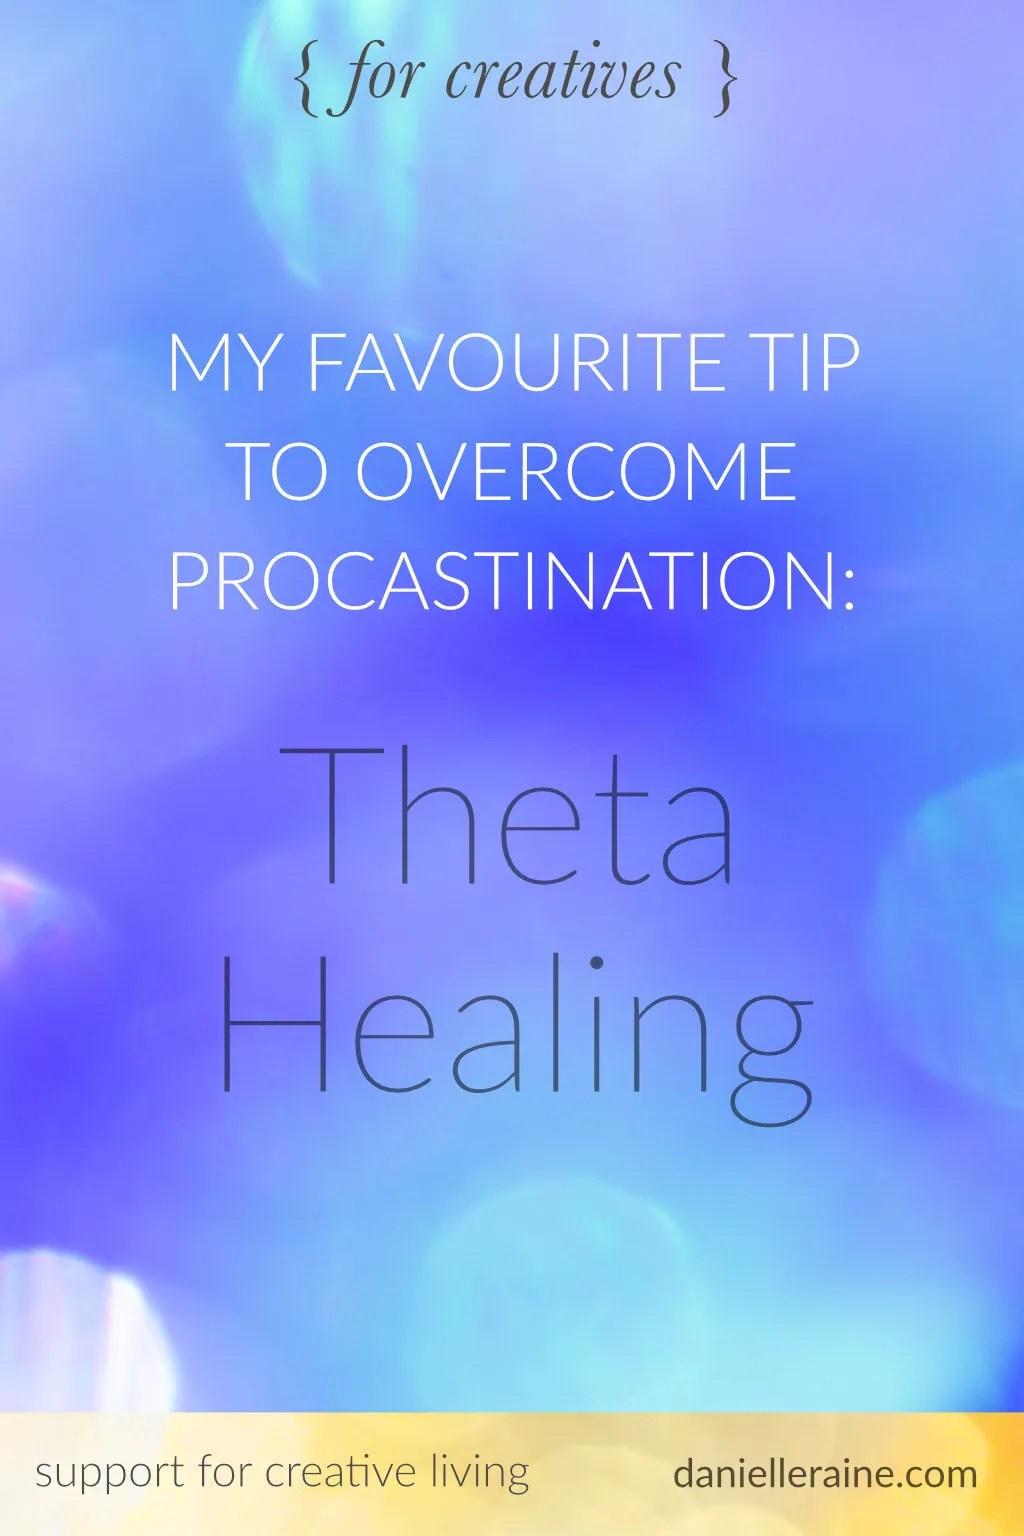 overcome procrastination for creatives theta healing pin